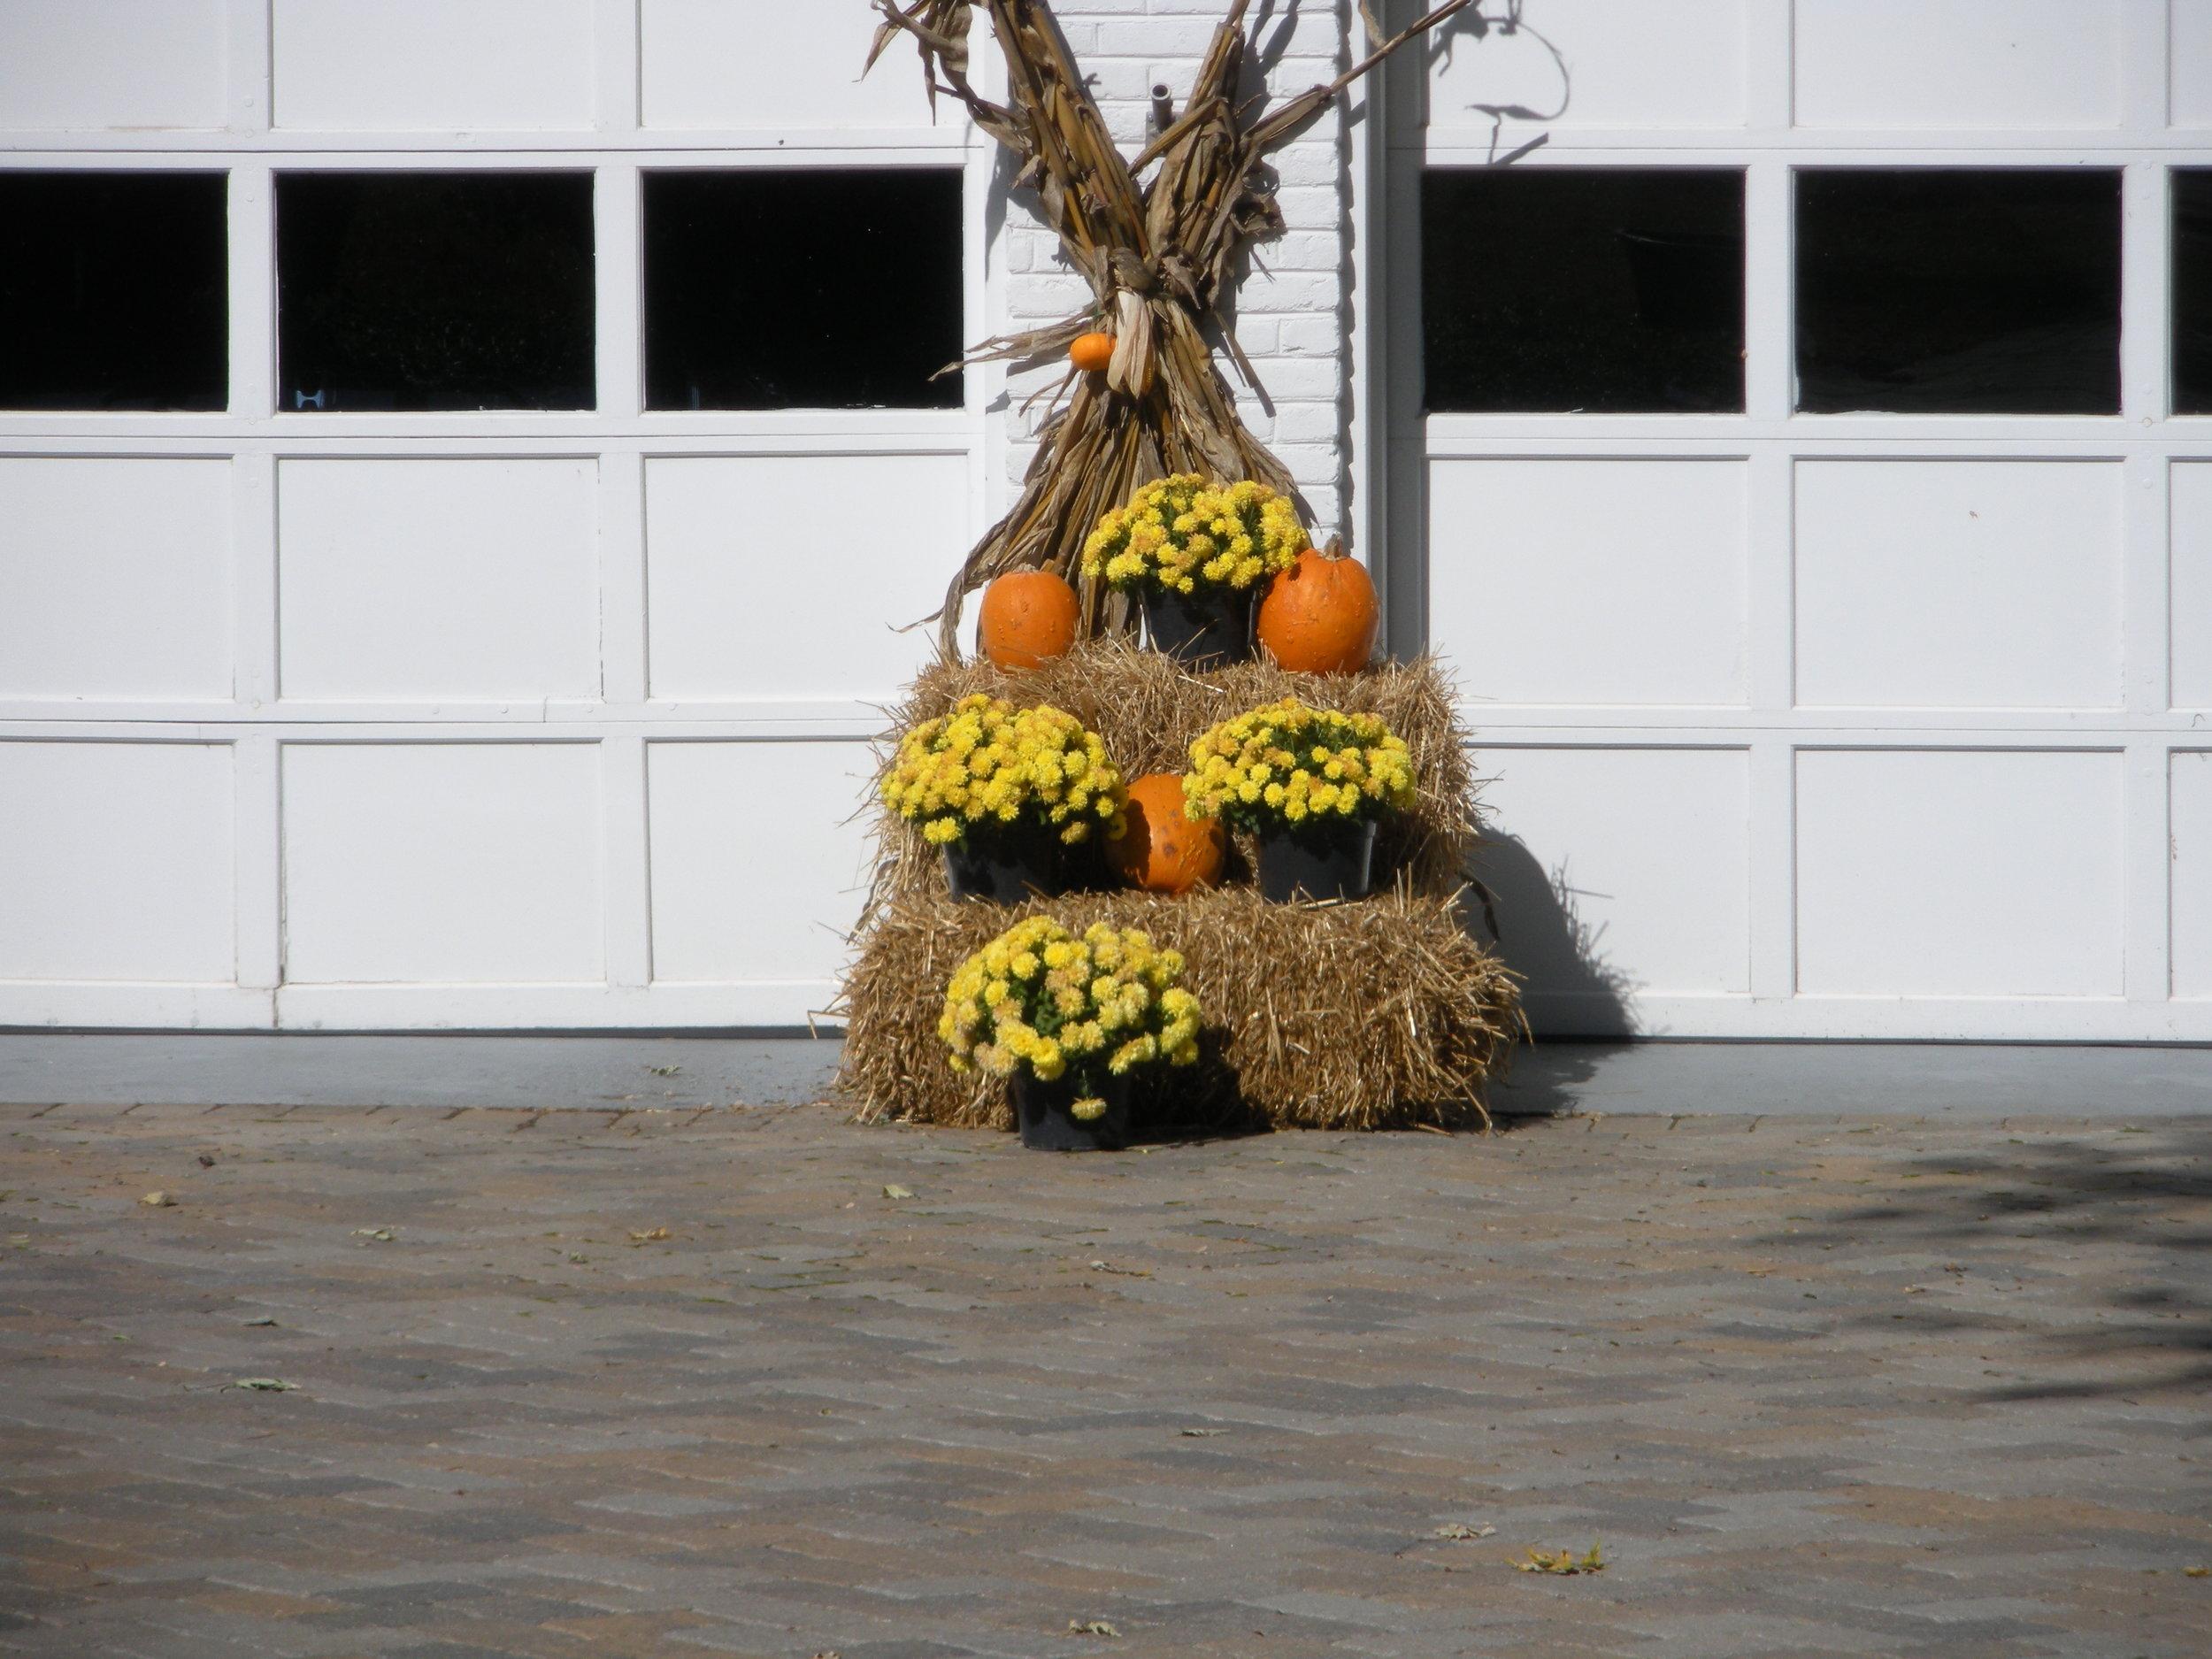 Seasonal Fall Display with Pumpkins and Chrysanthemums